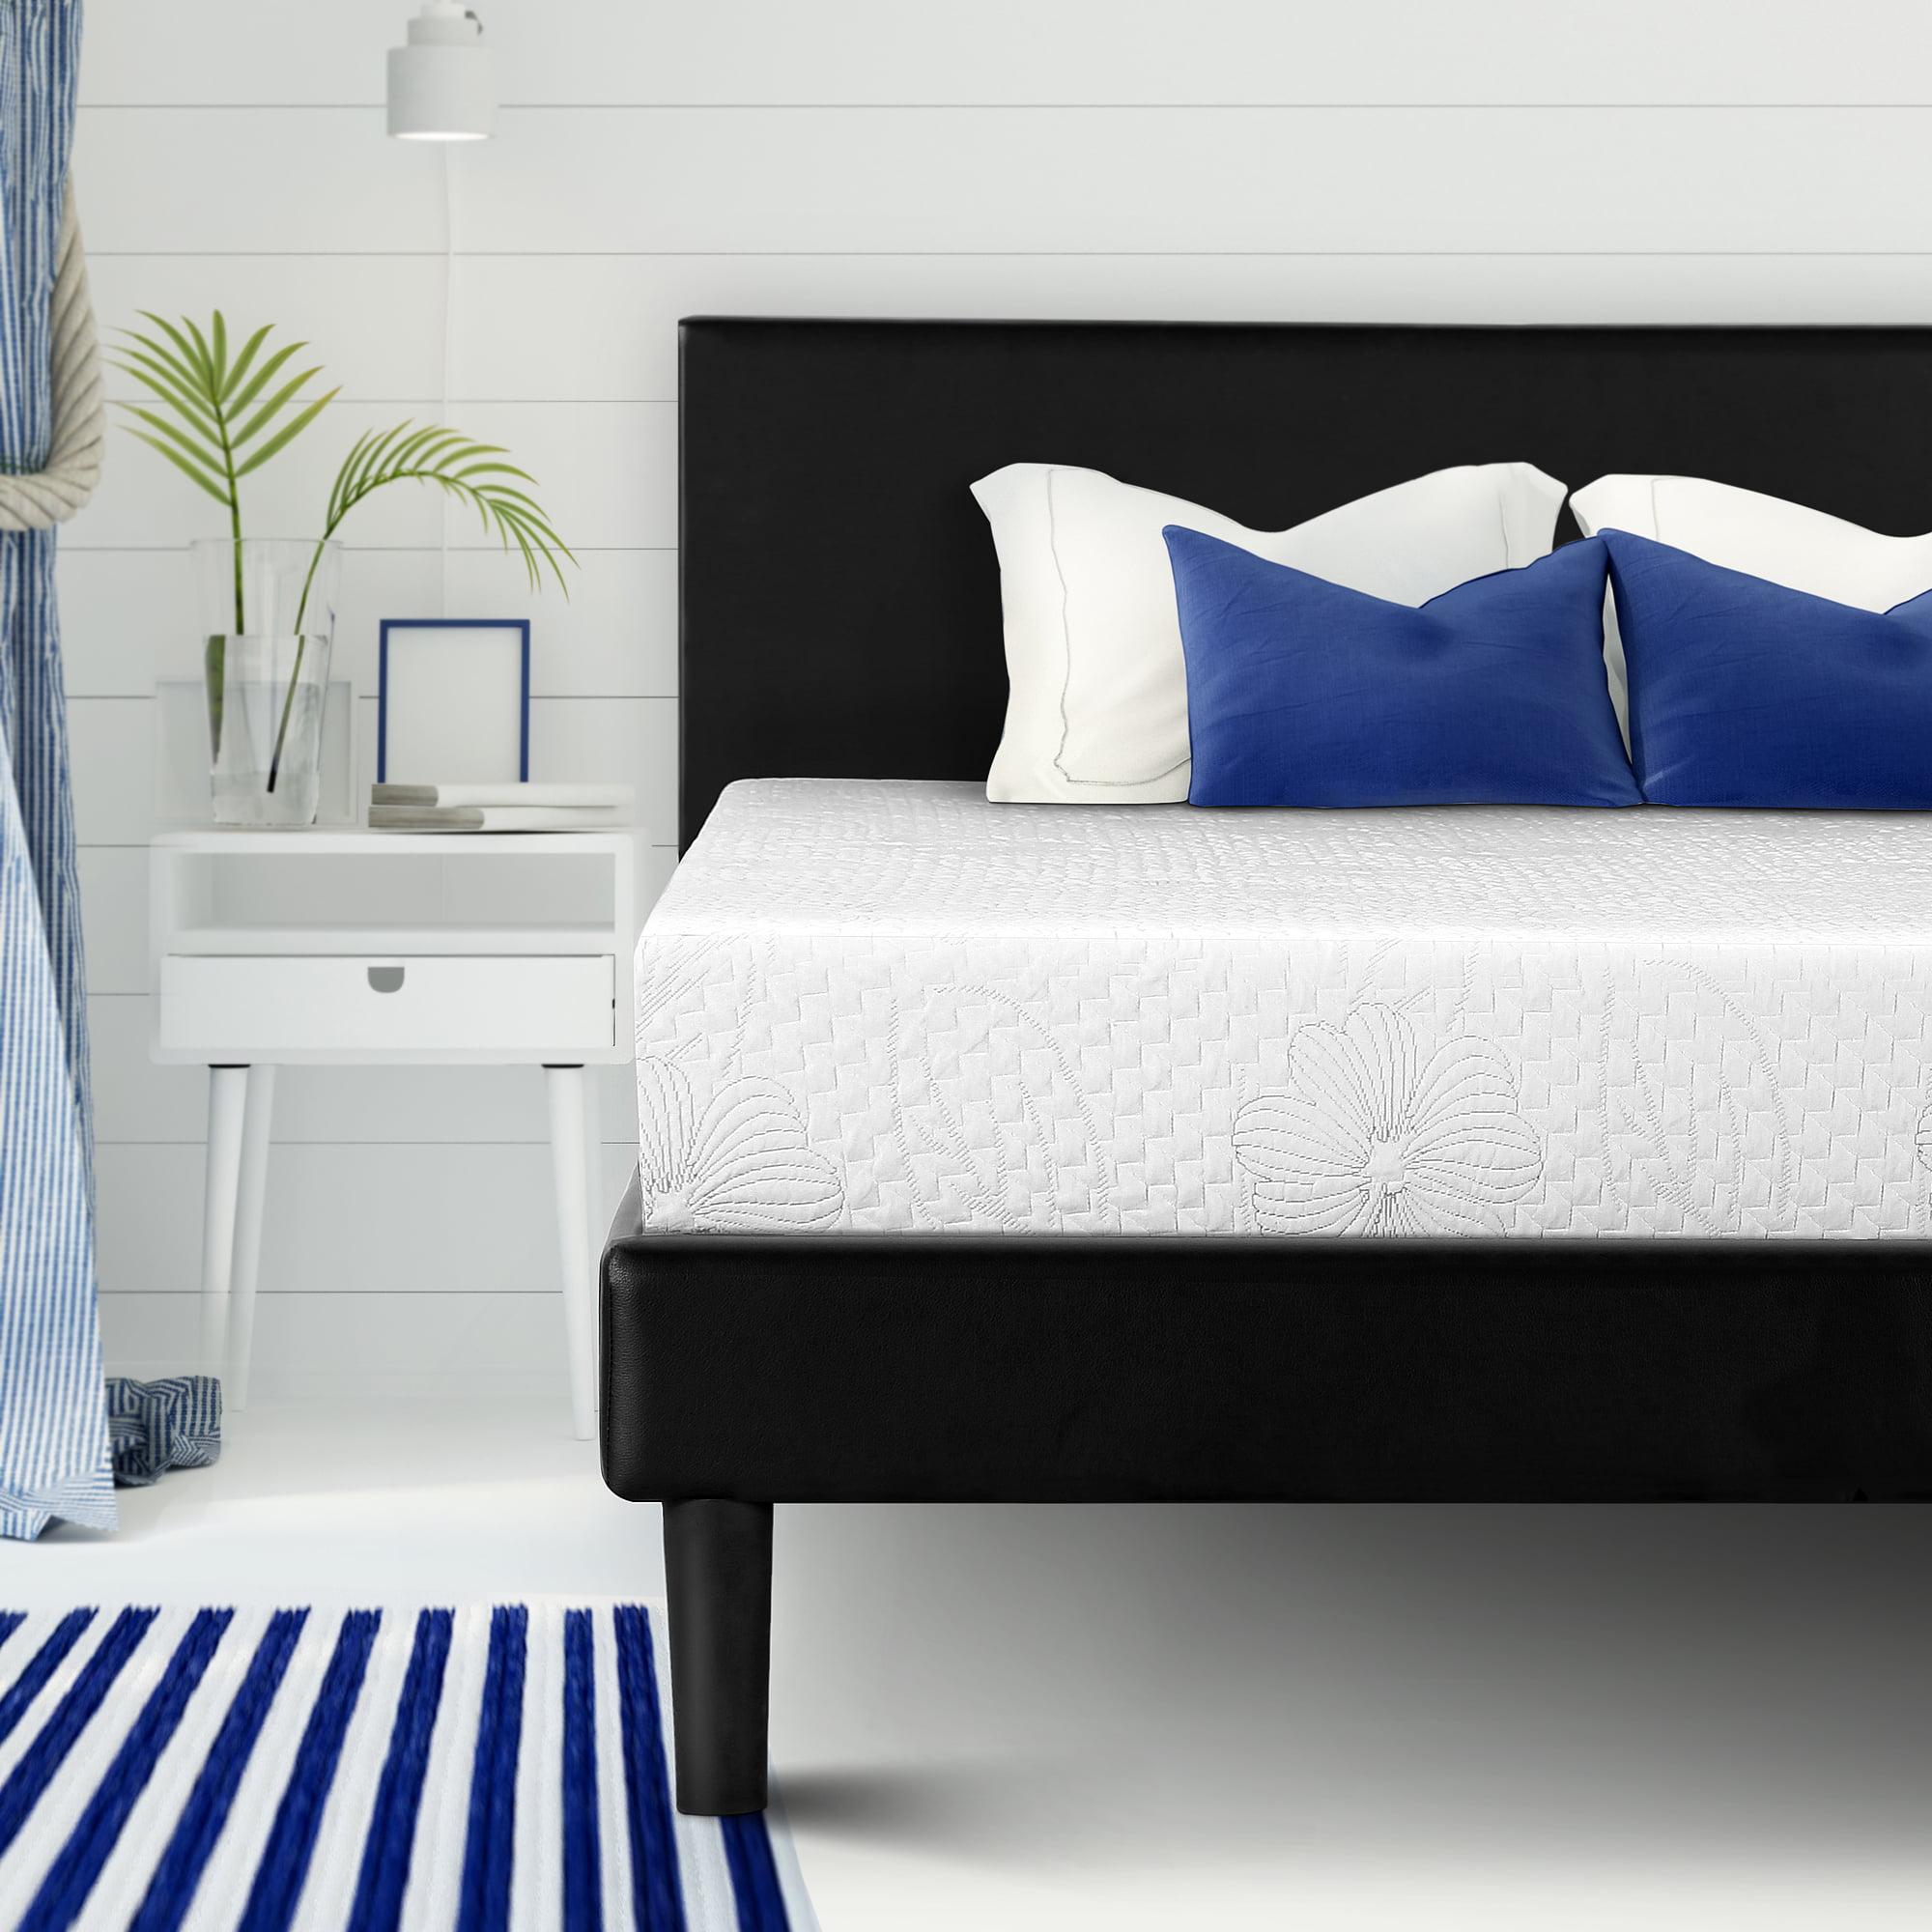 "GranRest 6"" Saturn Comfort Memory Foam Mattress Mattress-in-a-Box"